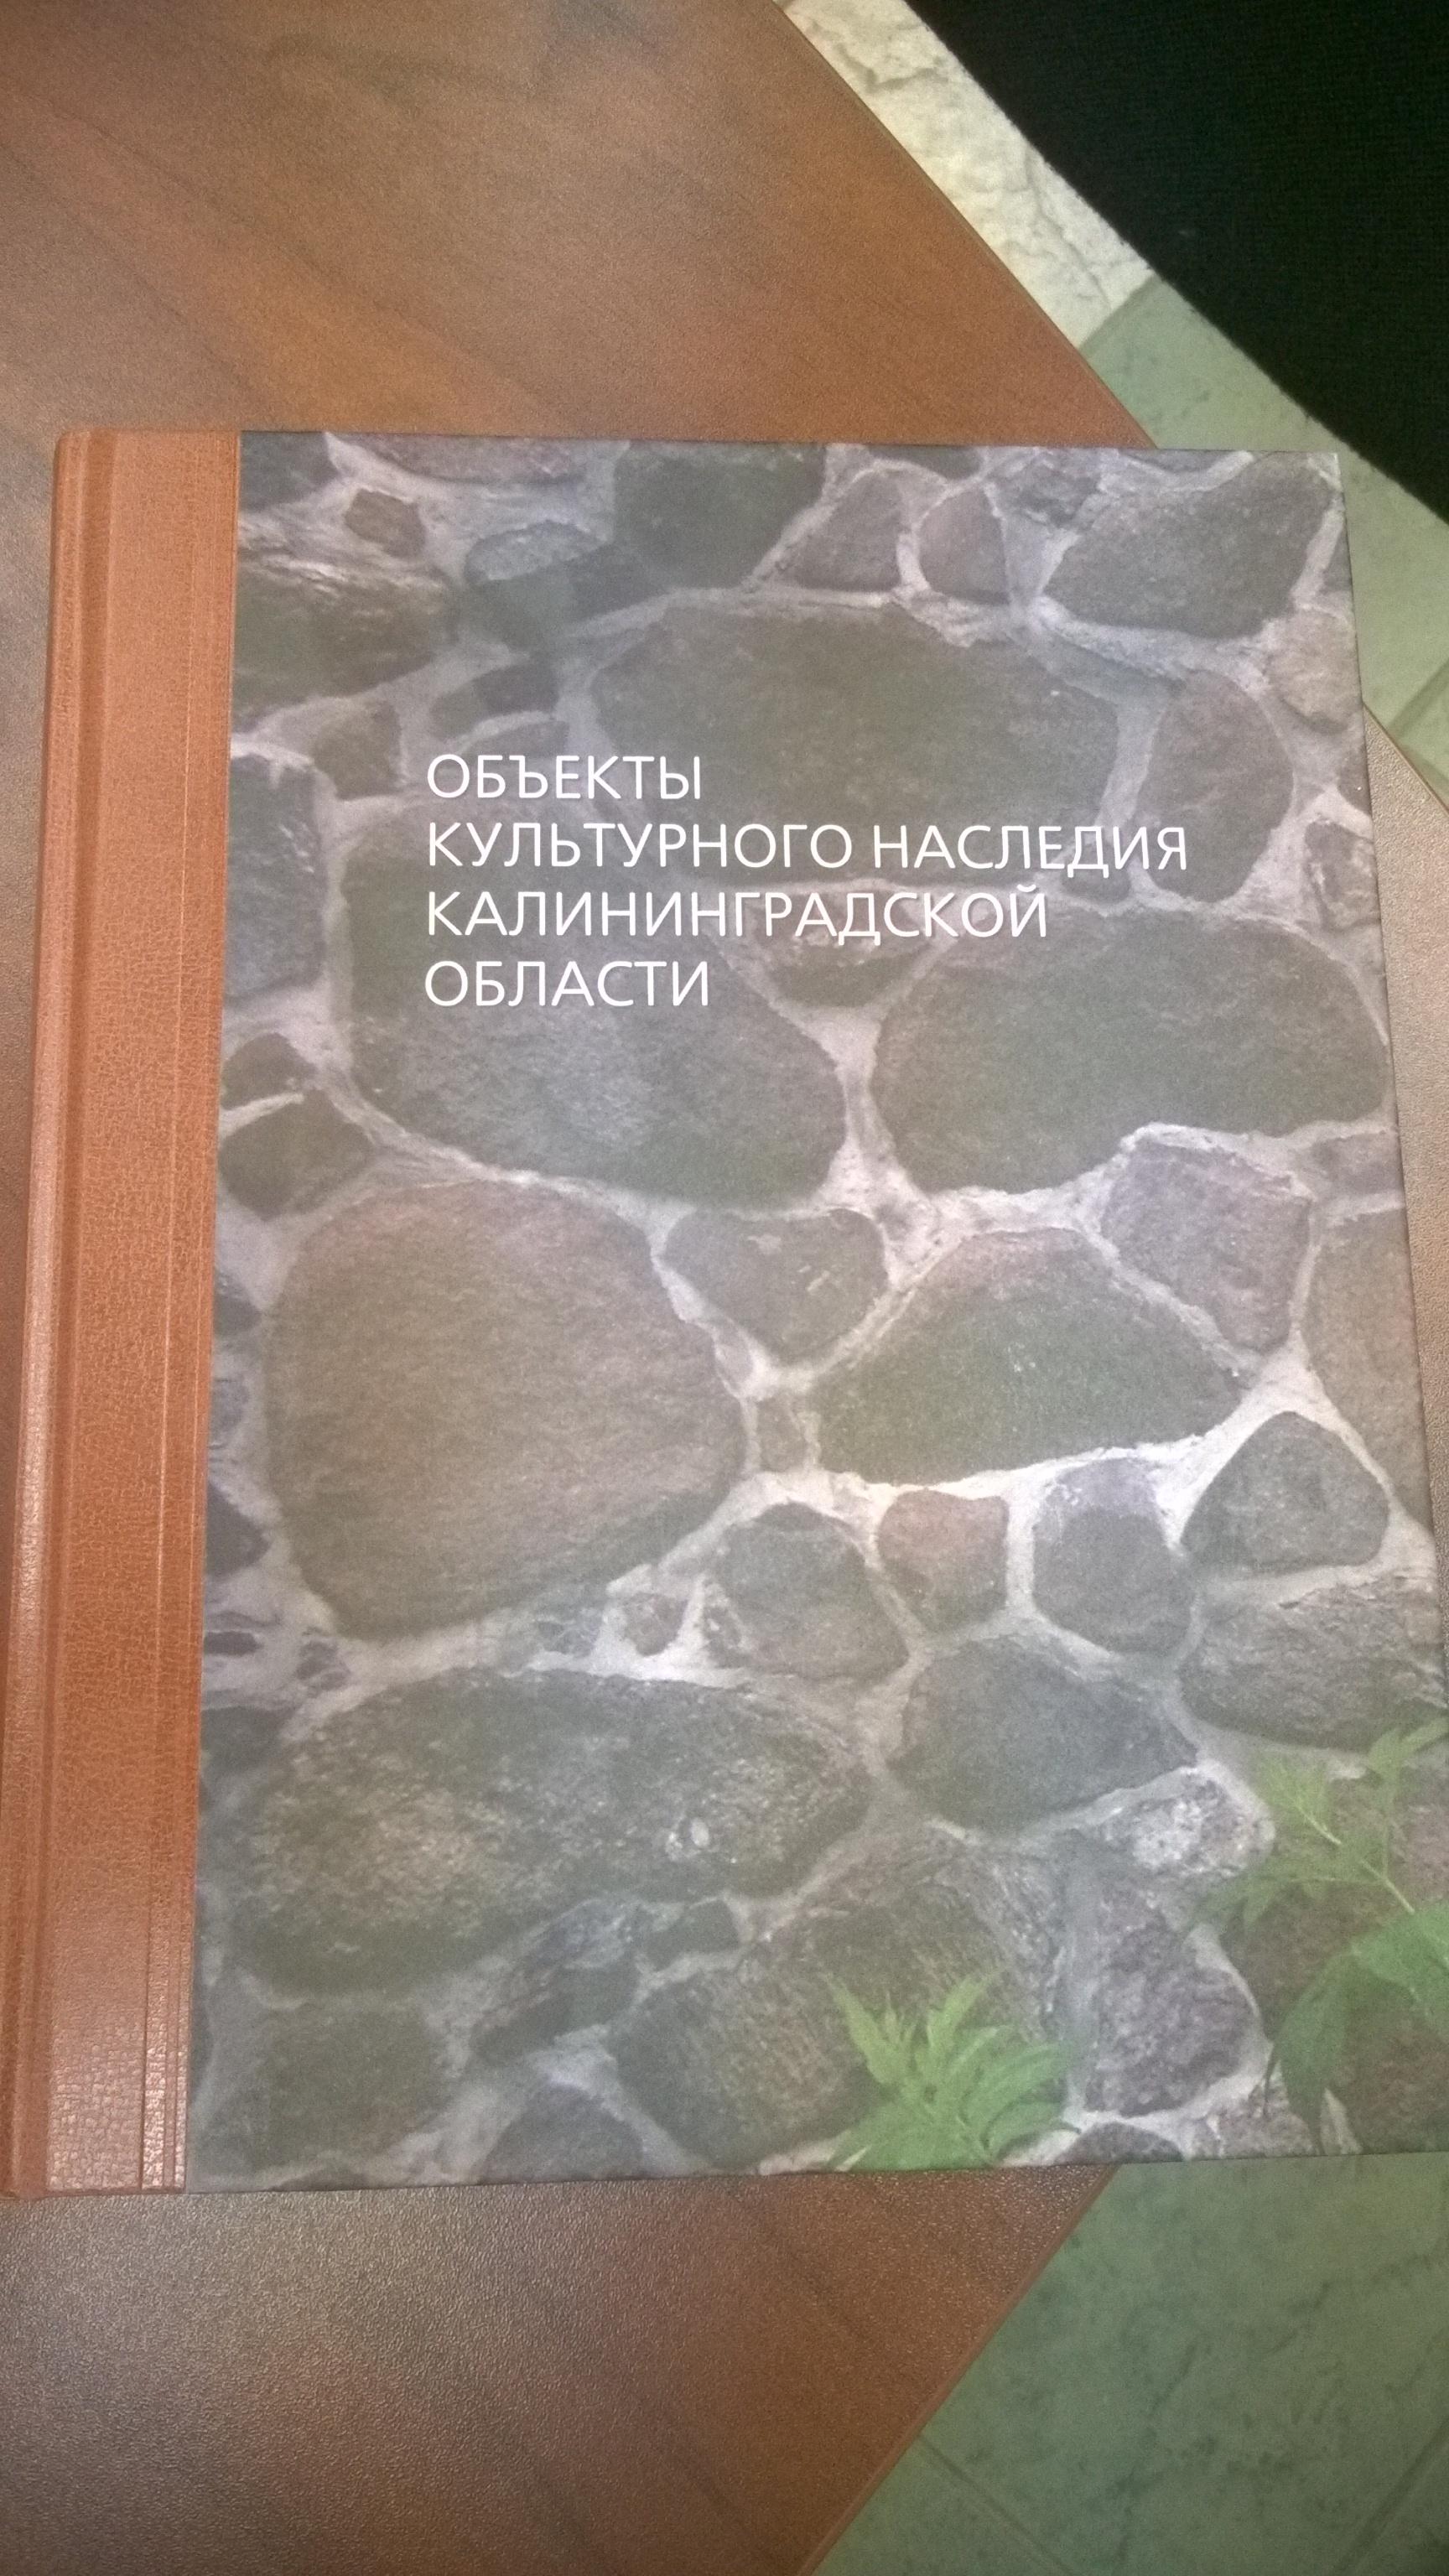 WP_20140908_17_41_50_Smart[2]